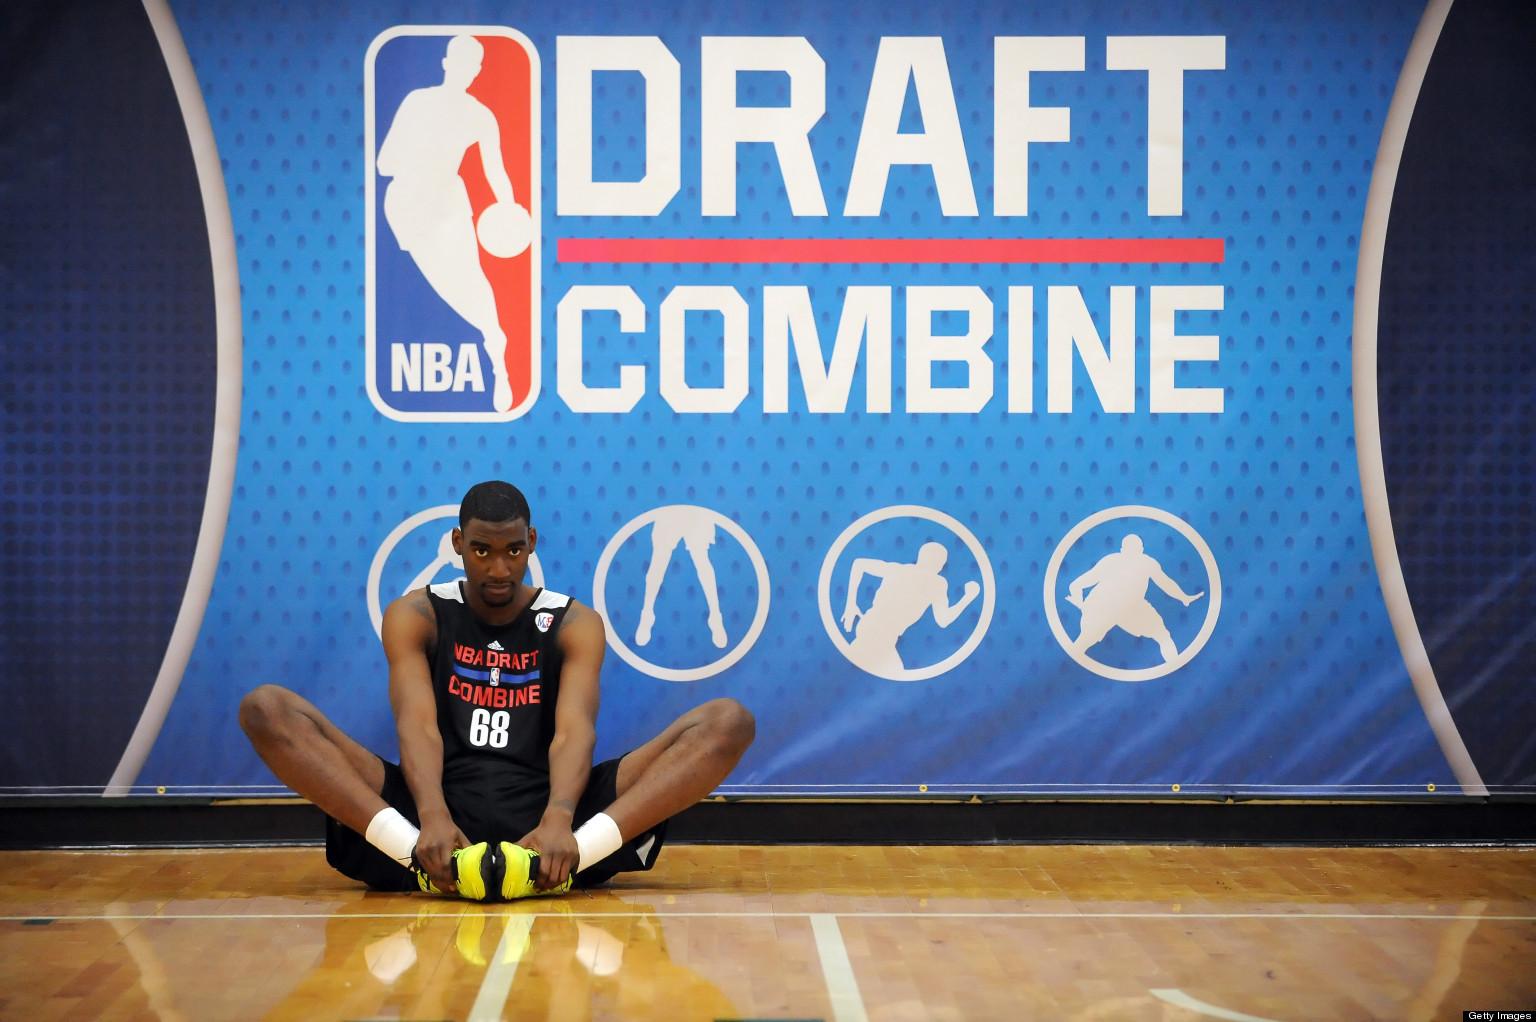 Nba Draft: 2013 NBA Mock Draft... With A Twist